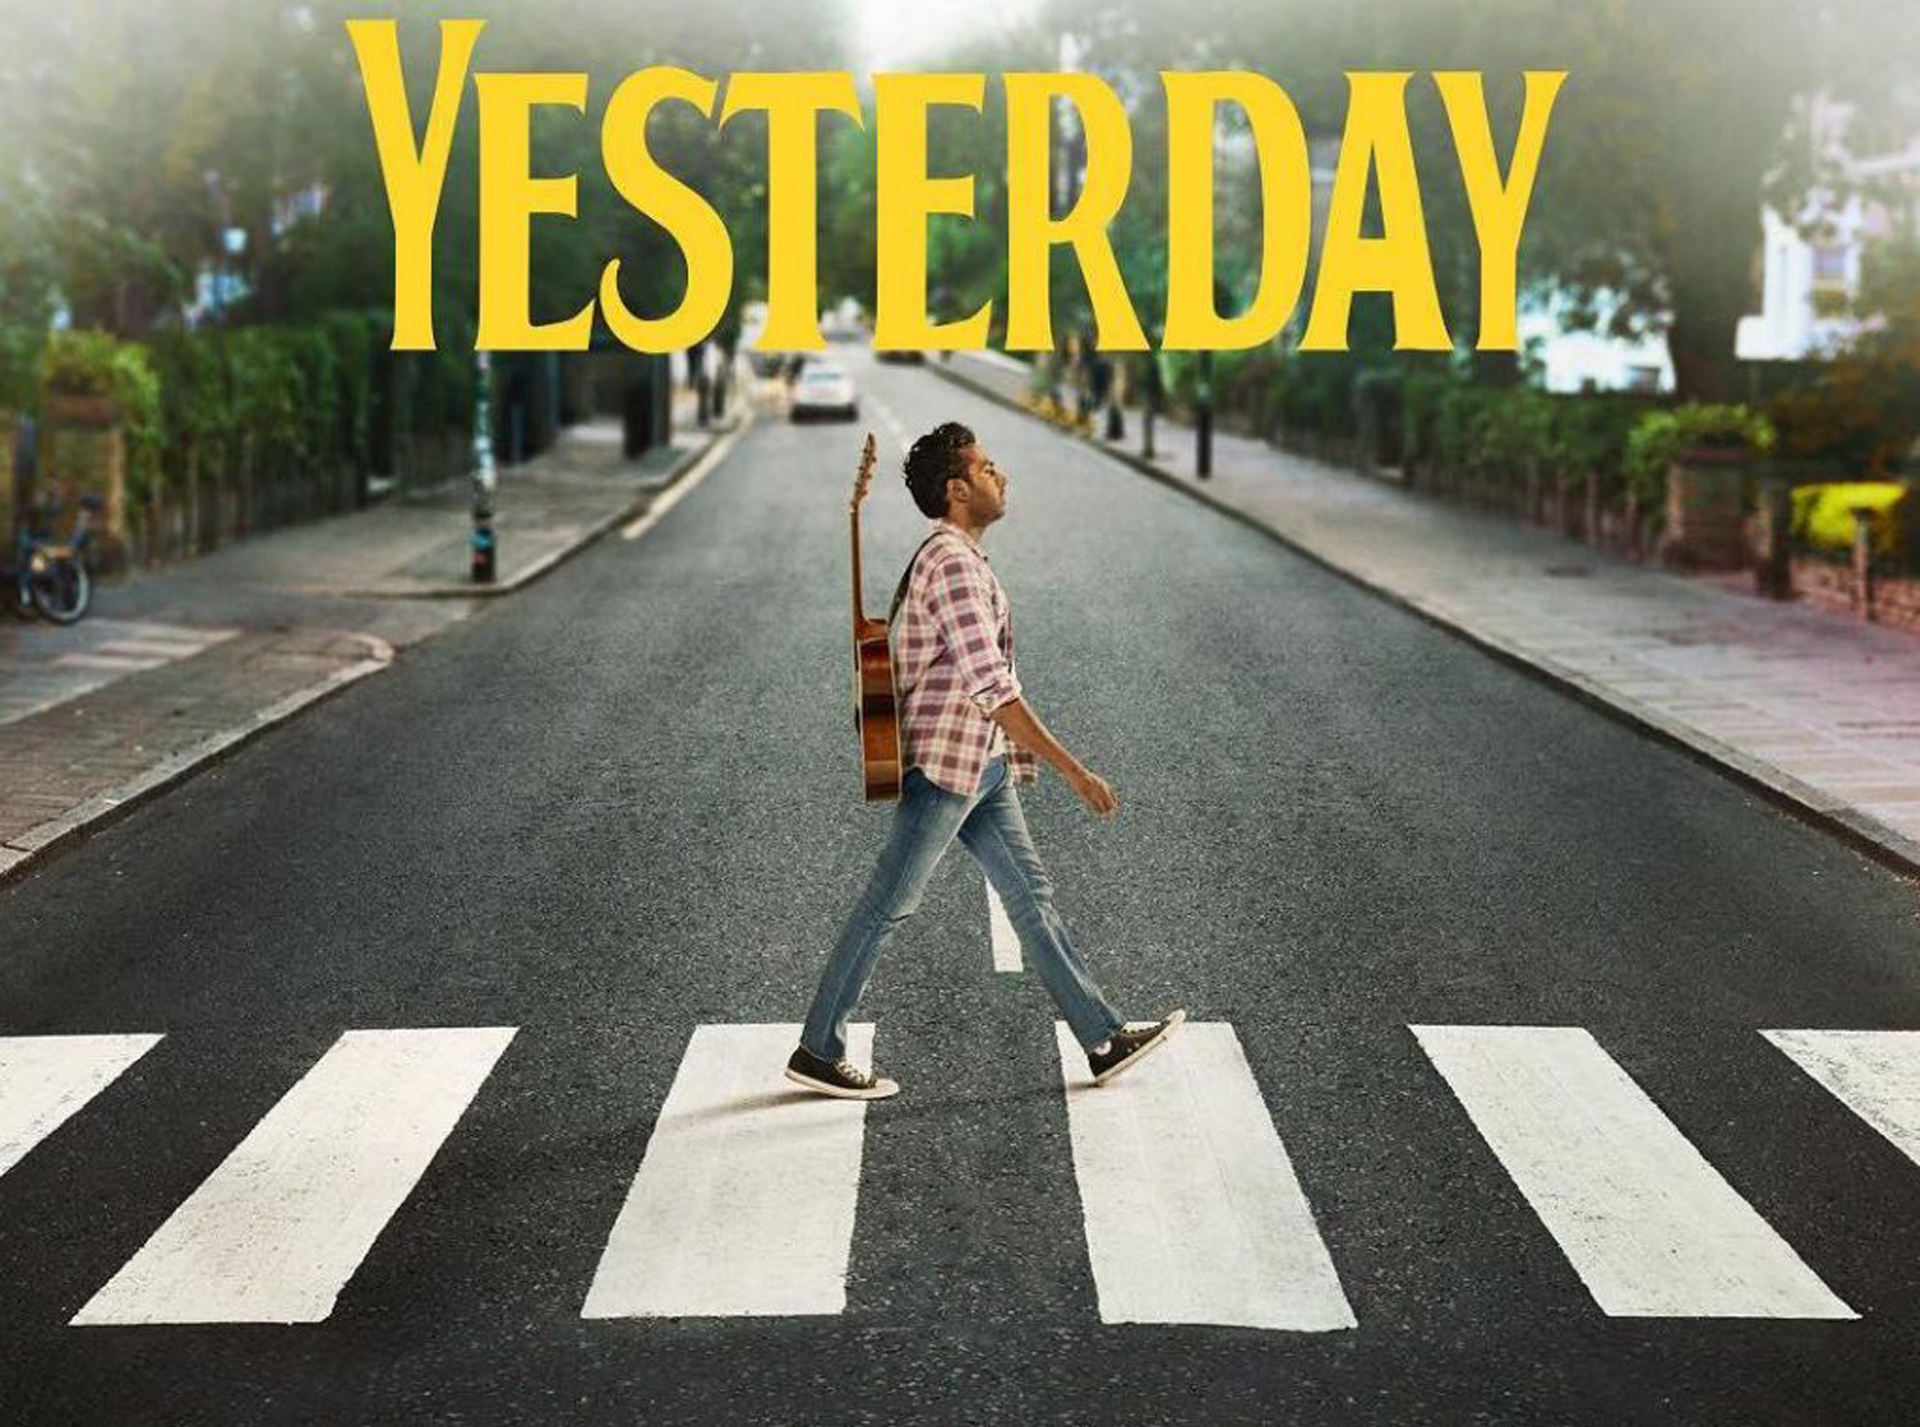 Crítica | Yesterday imagina mundo sem Beatles de forma descontraída, romântica e até emocionante